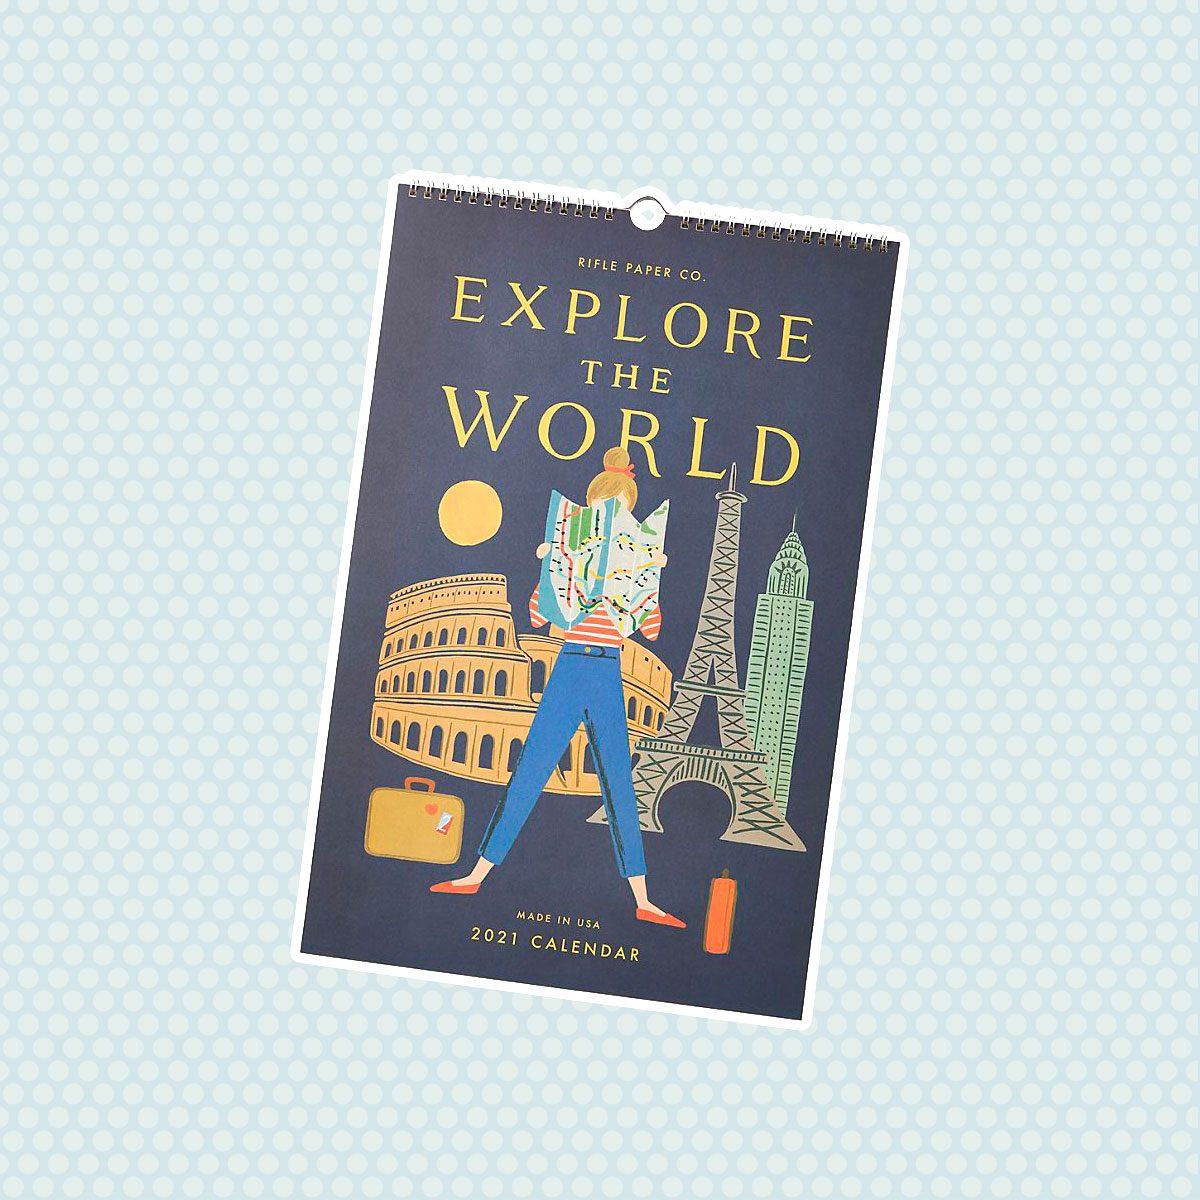 Rifle Paper Co. Explore The World 2021 Wall Calendar